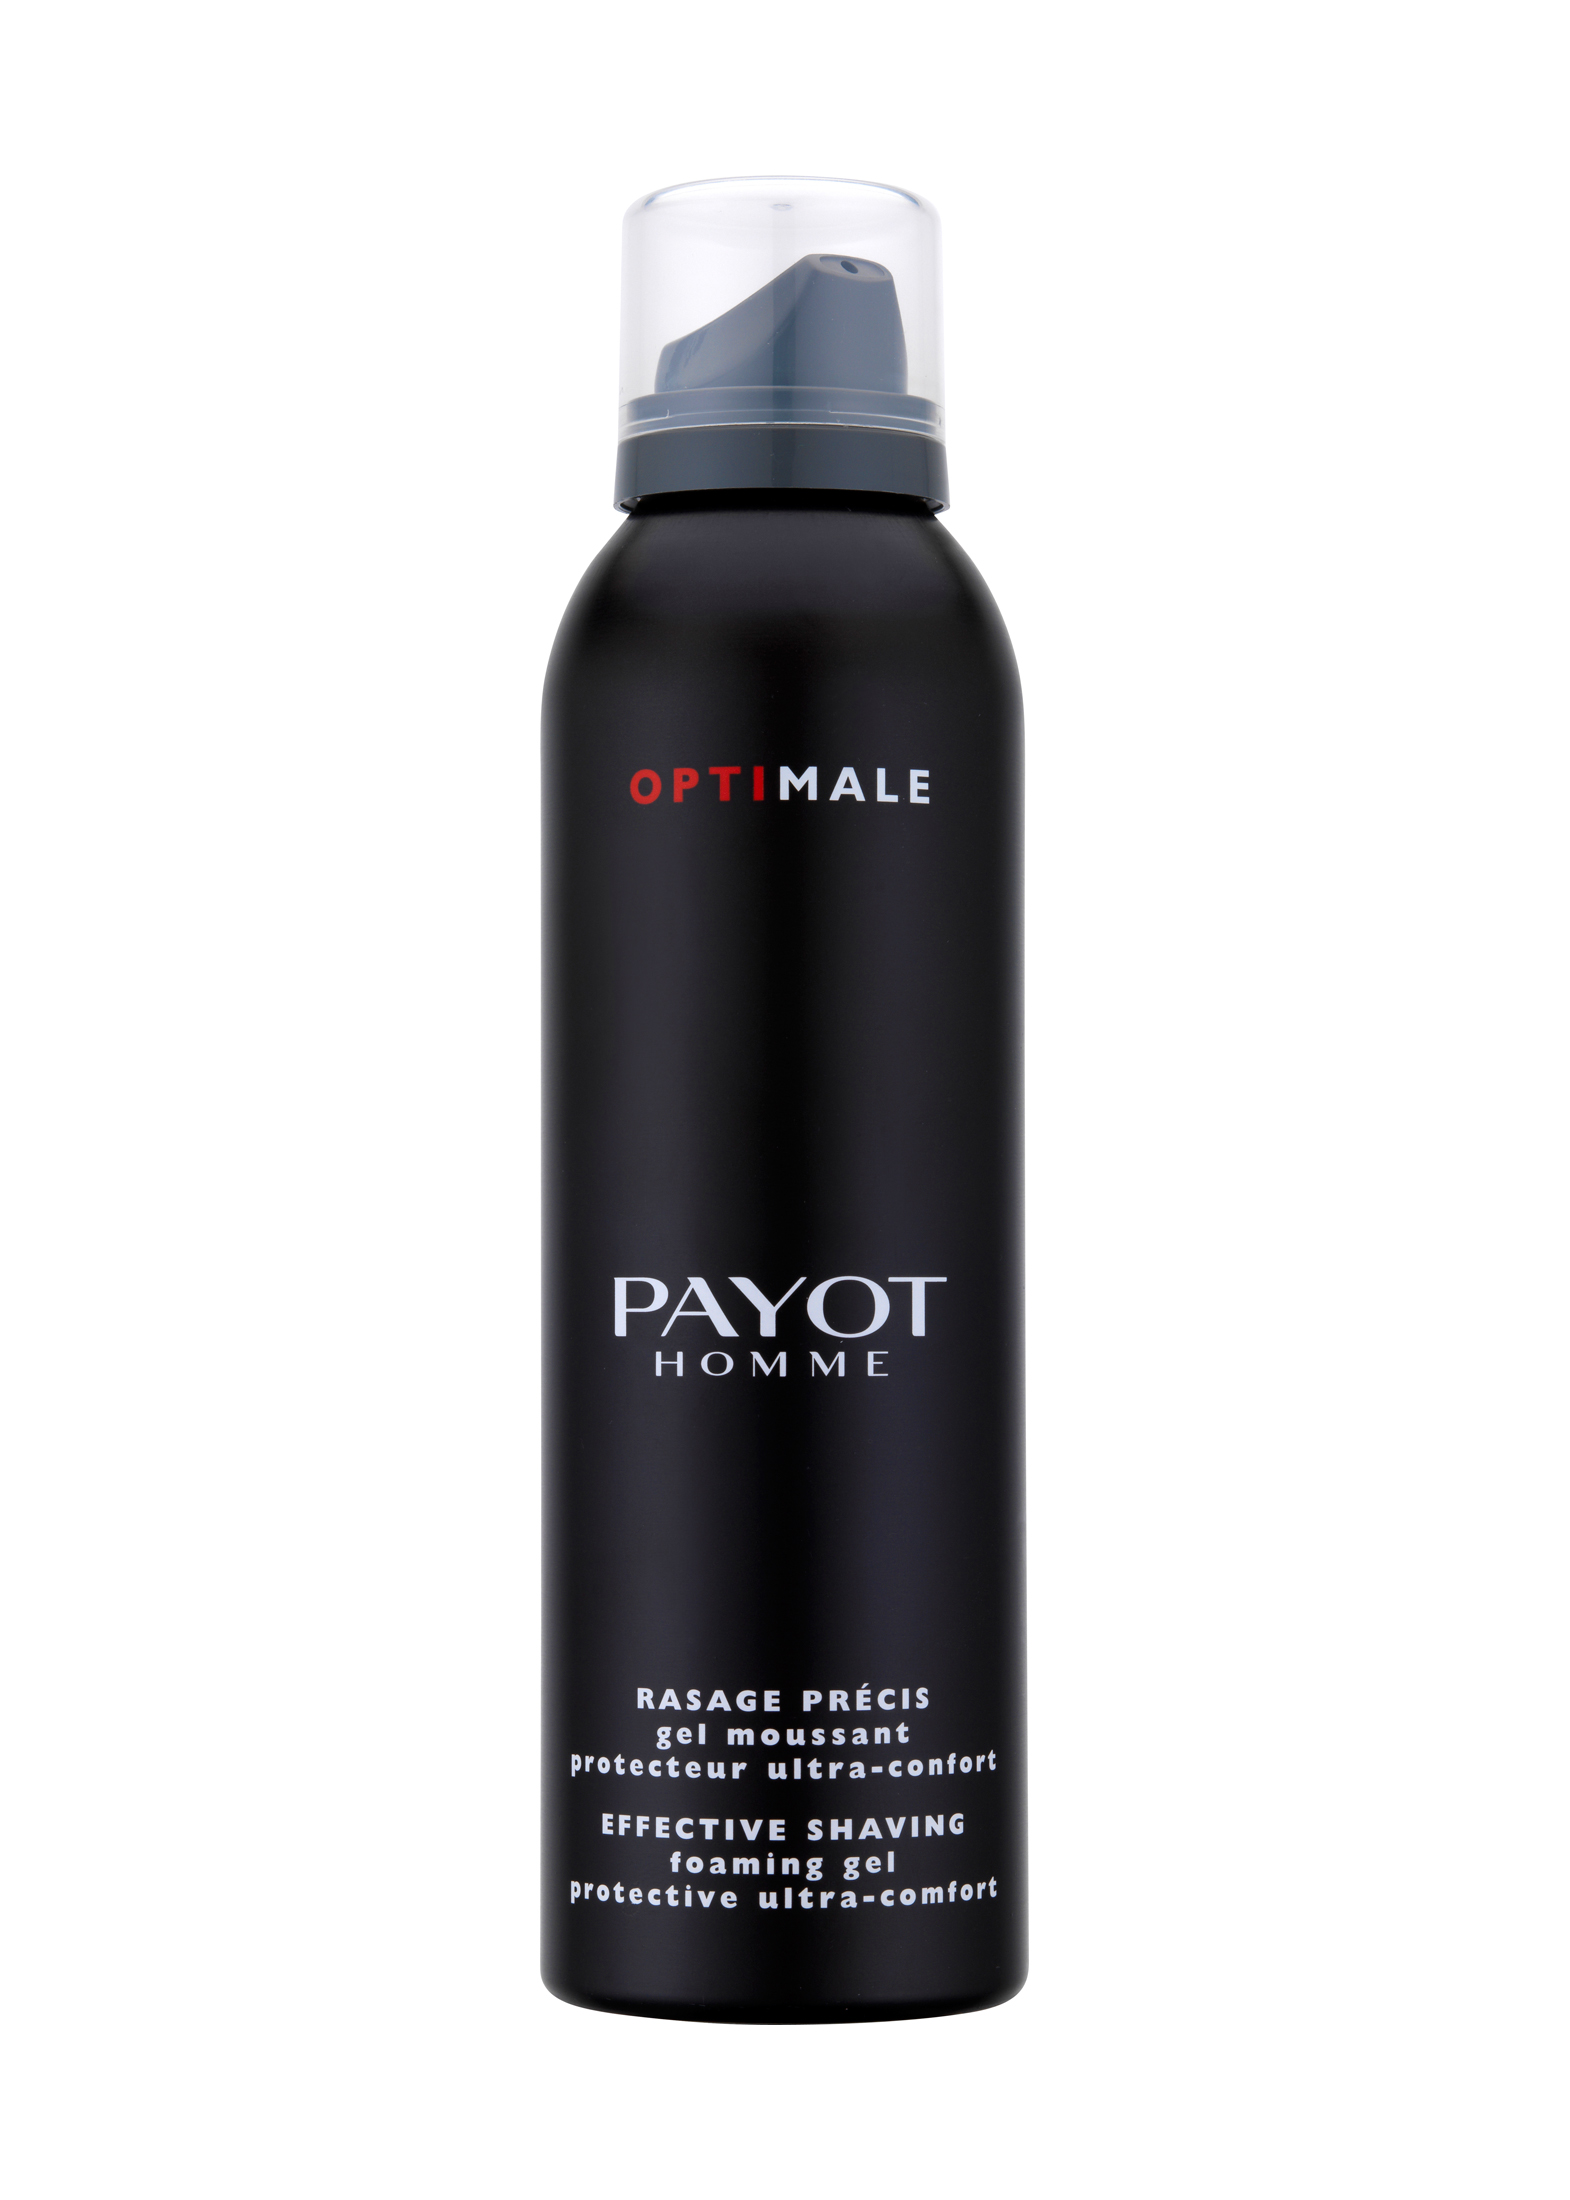 PAYOT,  Rasage Precis, 100 ml image number 0